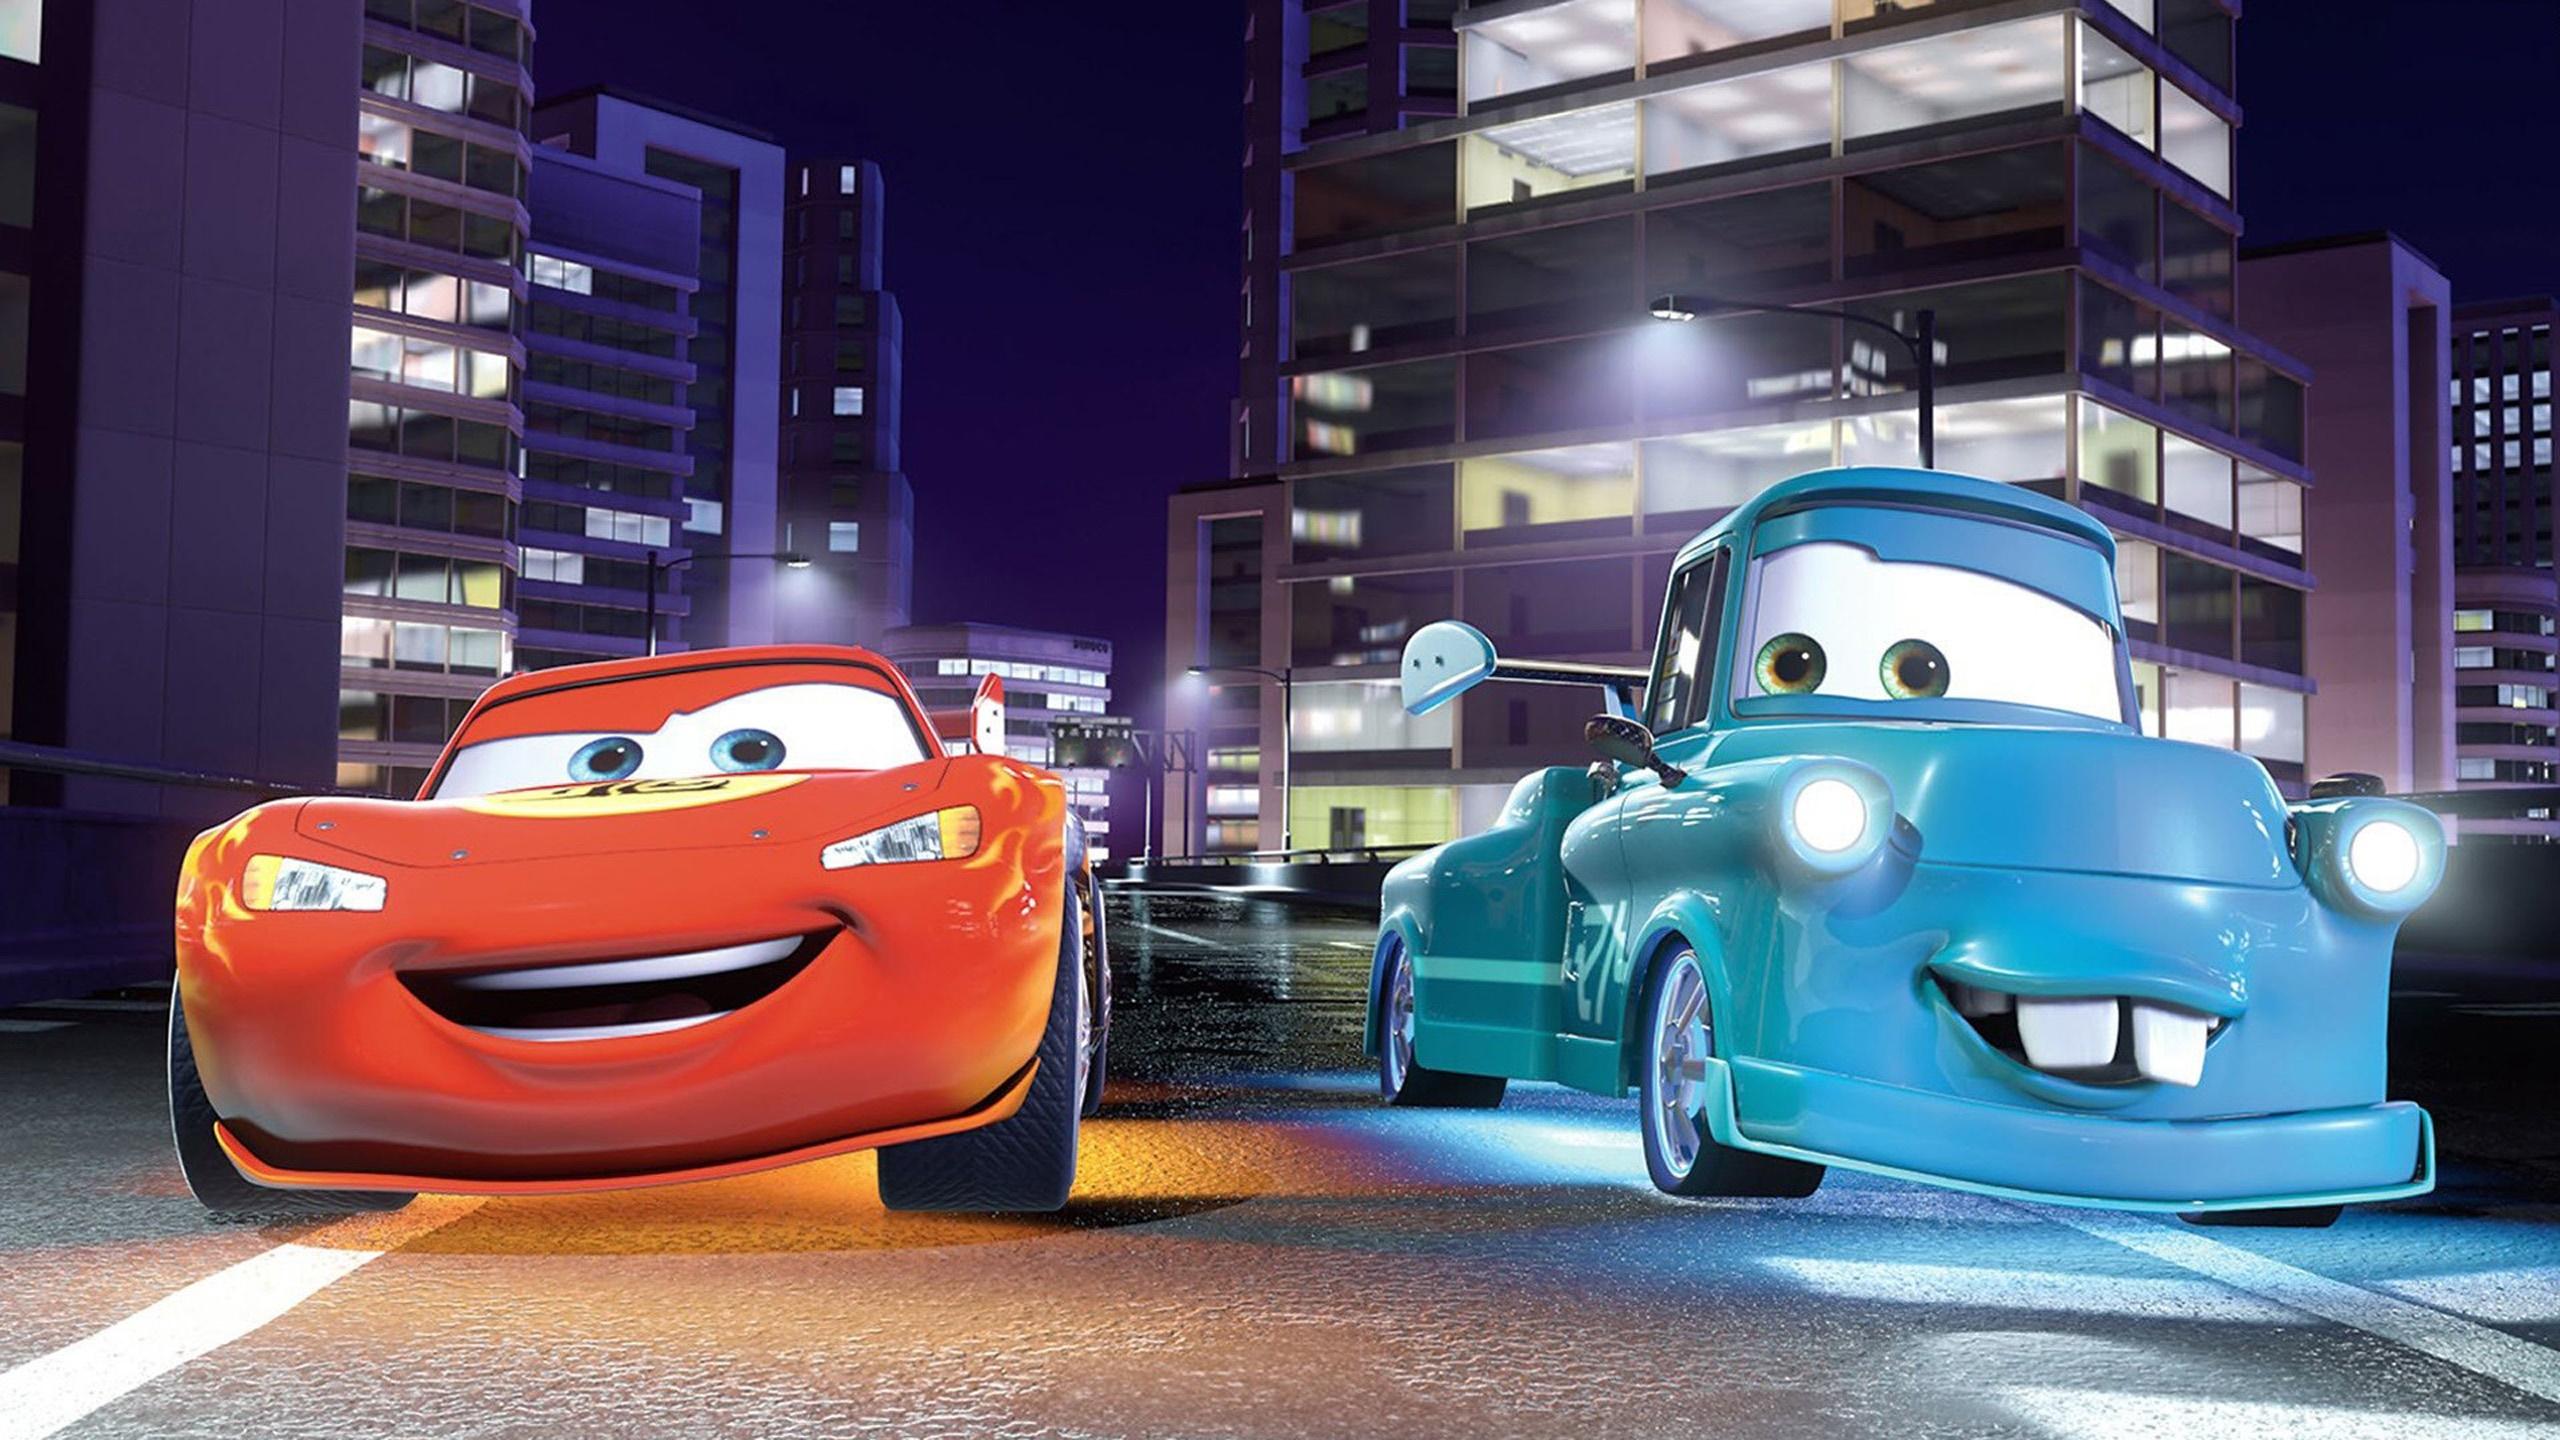 Cars Cartoon Background Hd 2560x1440 Wallpaper Teahub Io